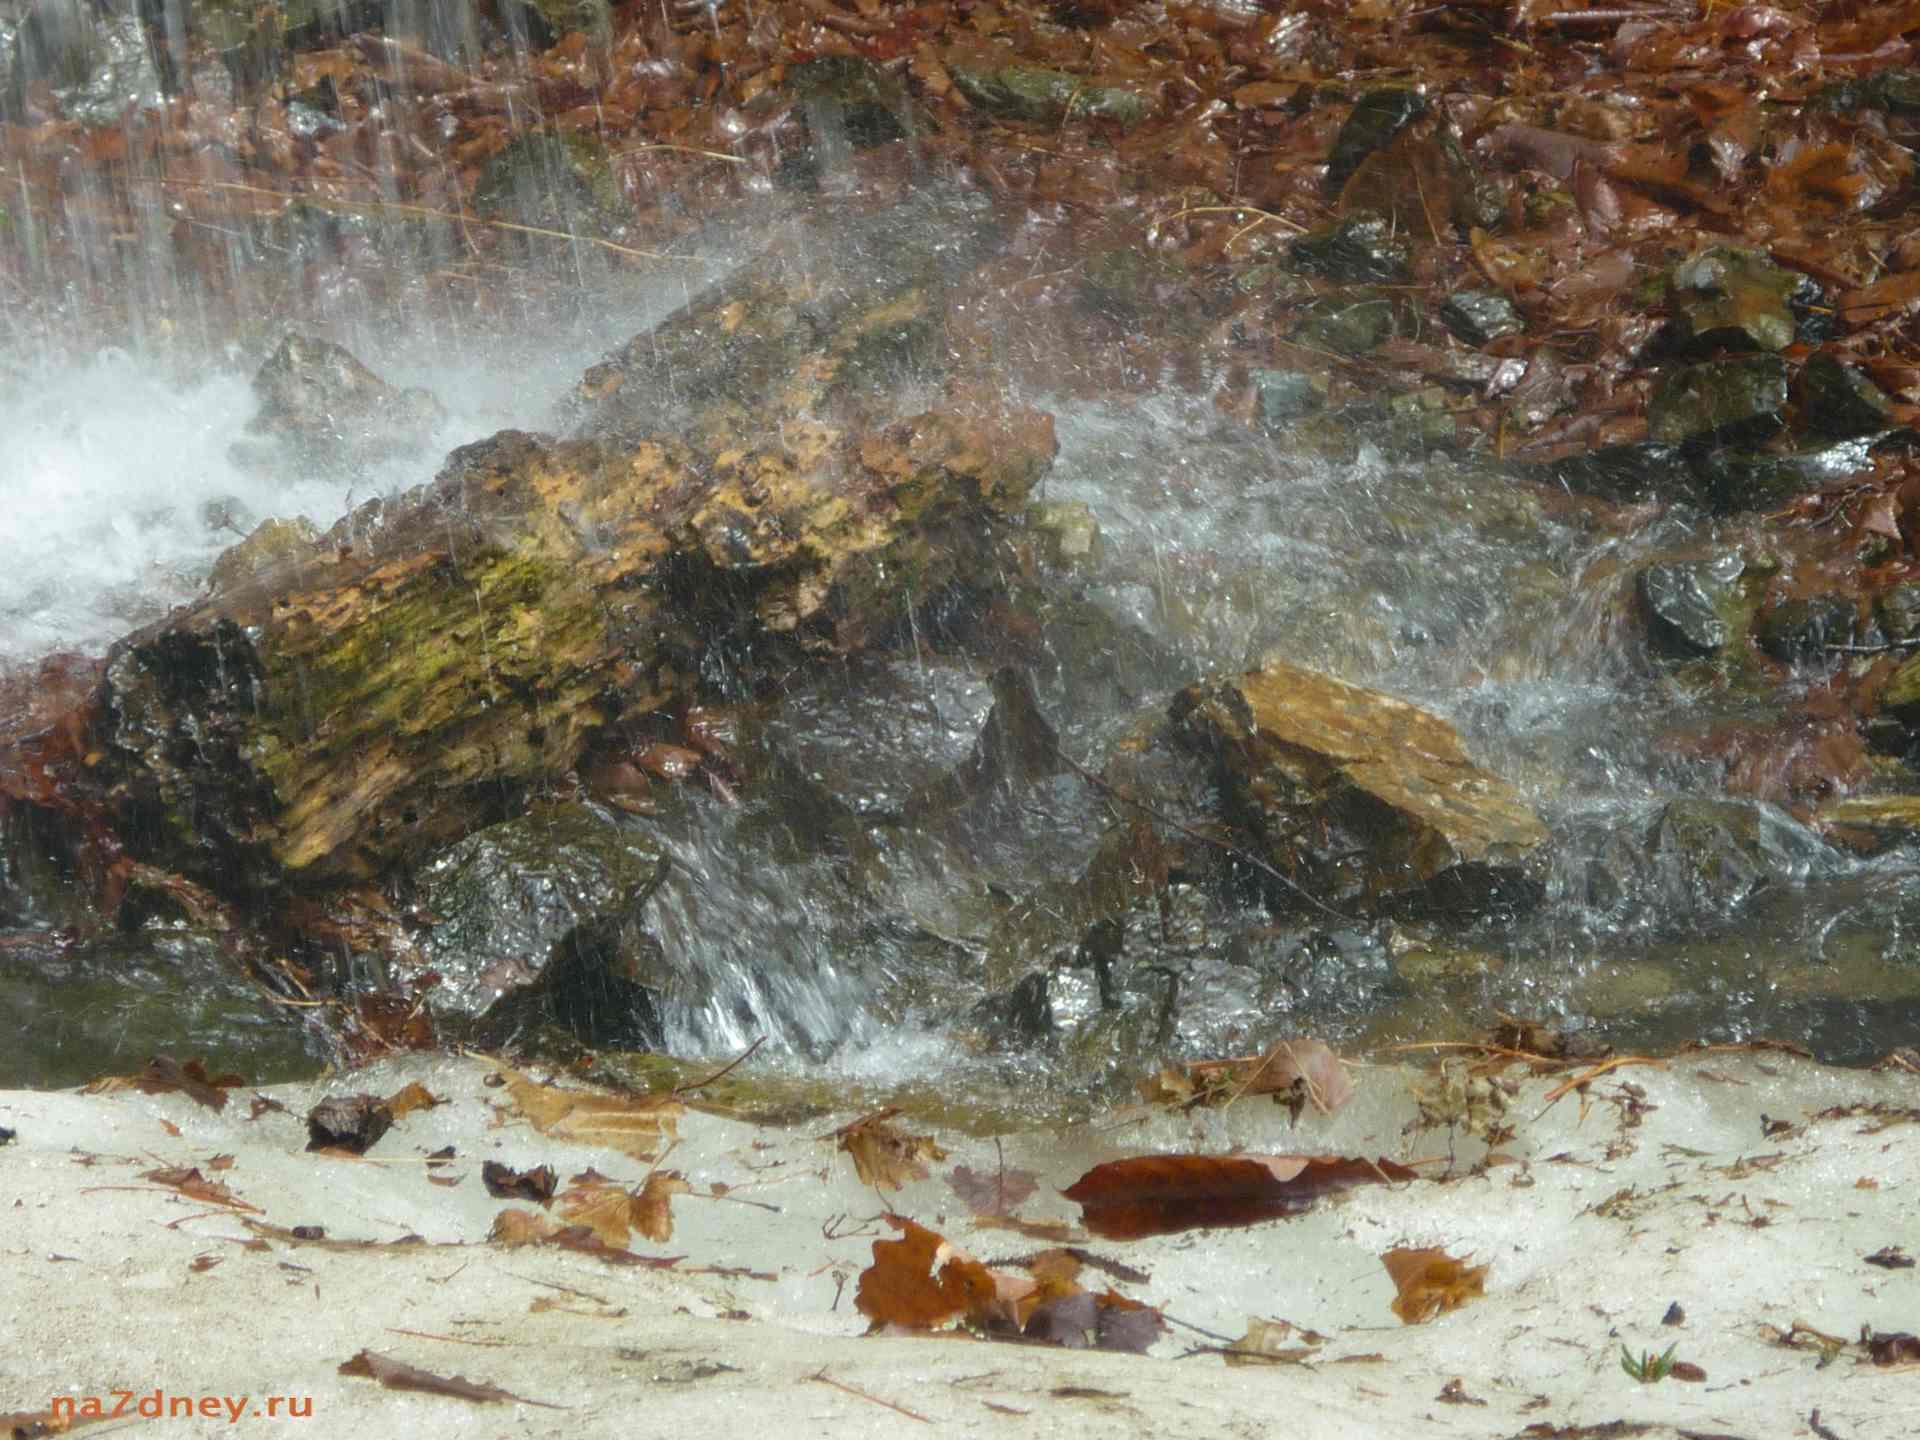 Водопад Берендей